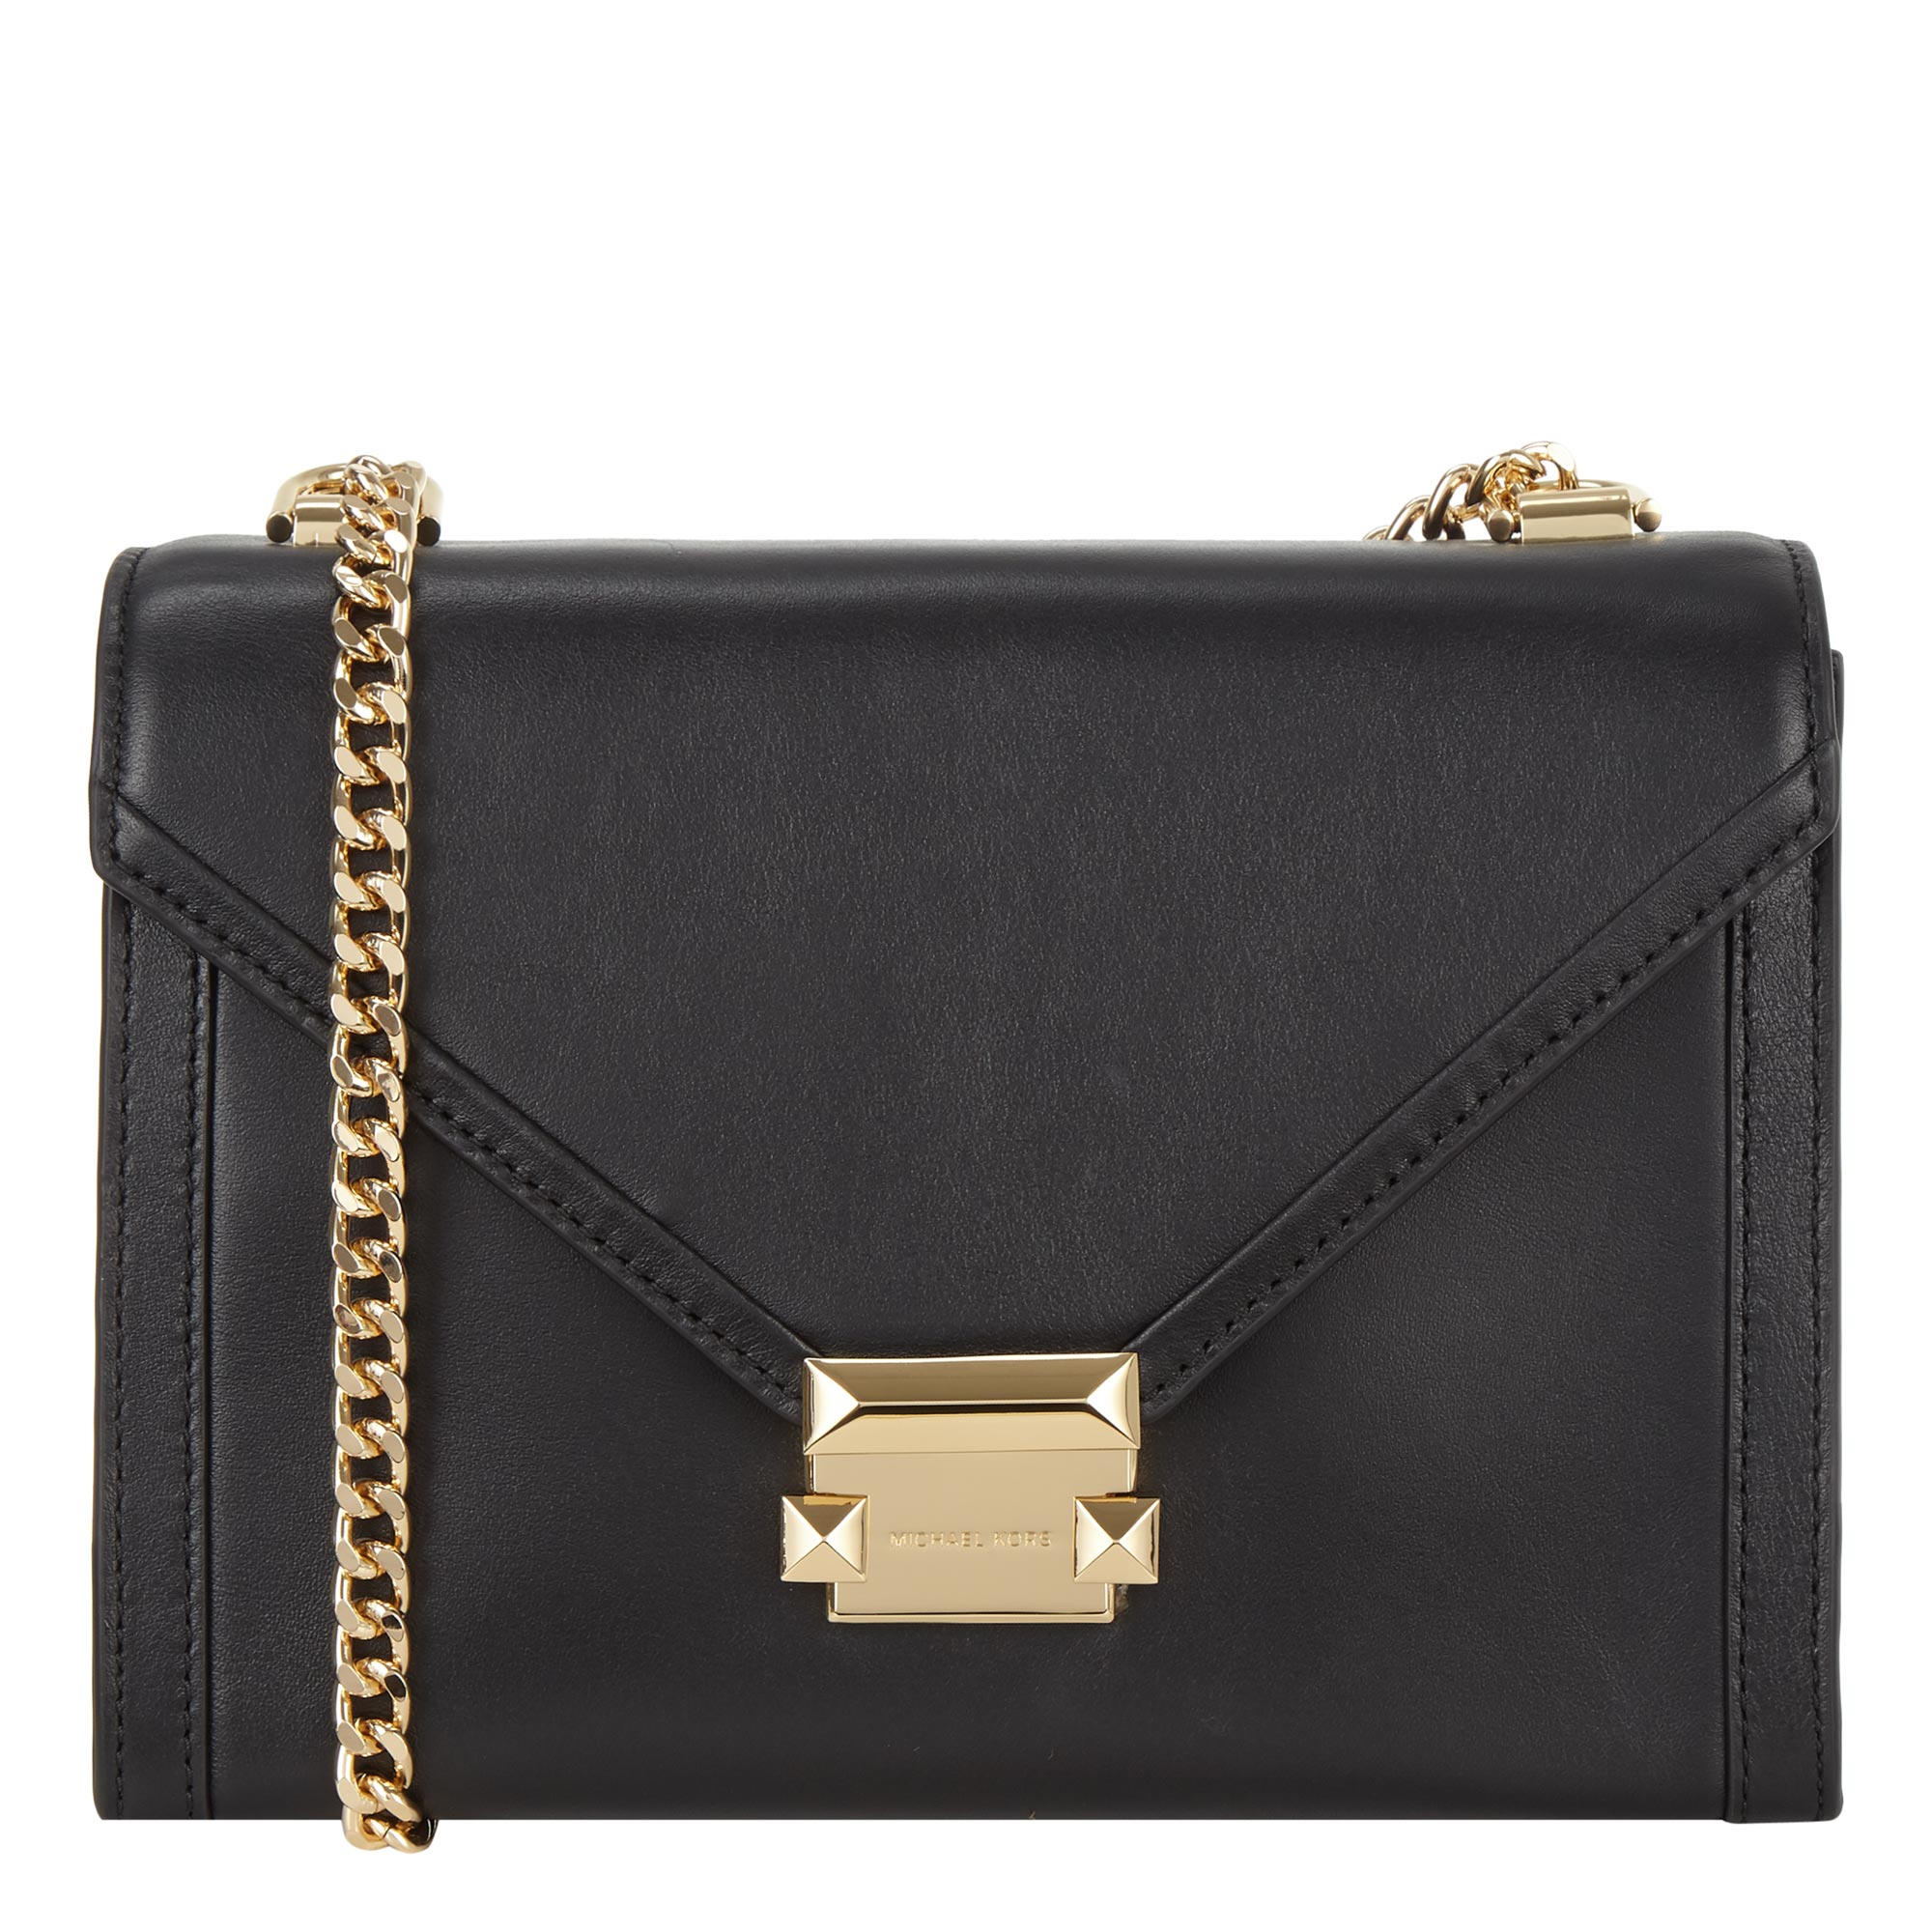 131659382: Whitney Chain Shoulder Bag Large